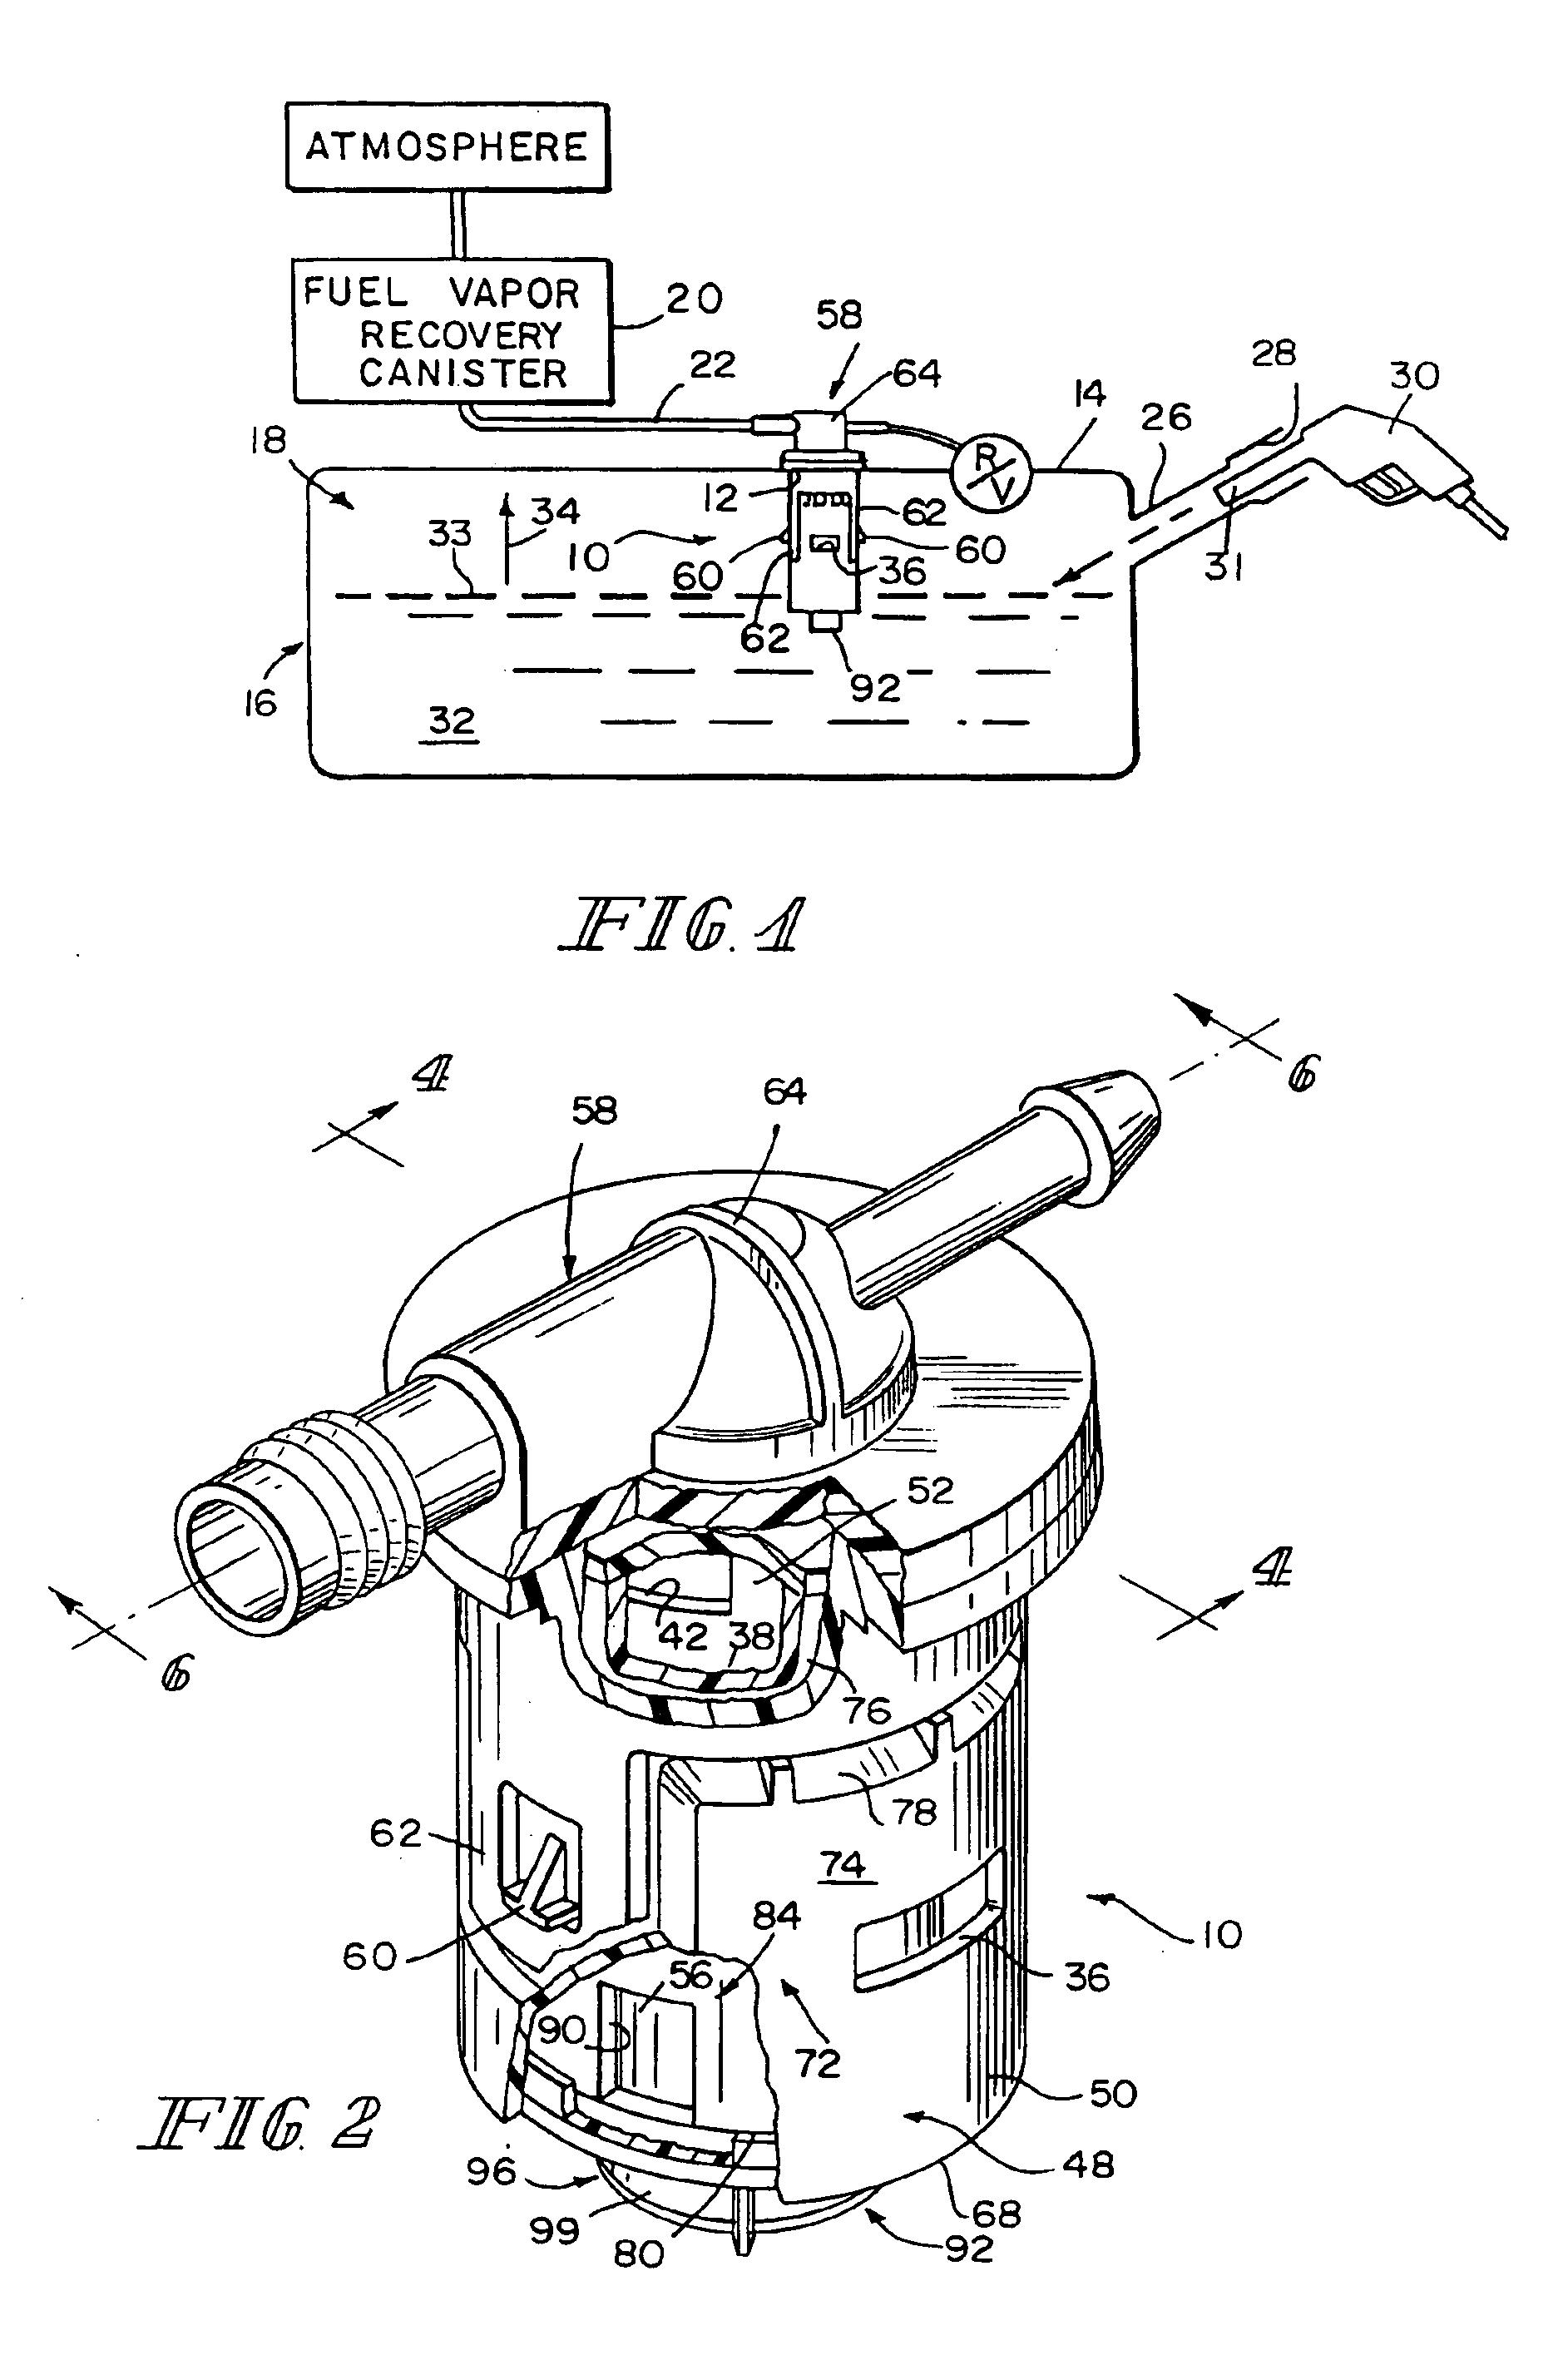 Fuel Storage Tank Filter